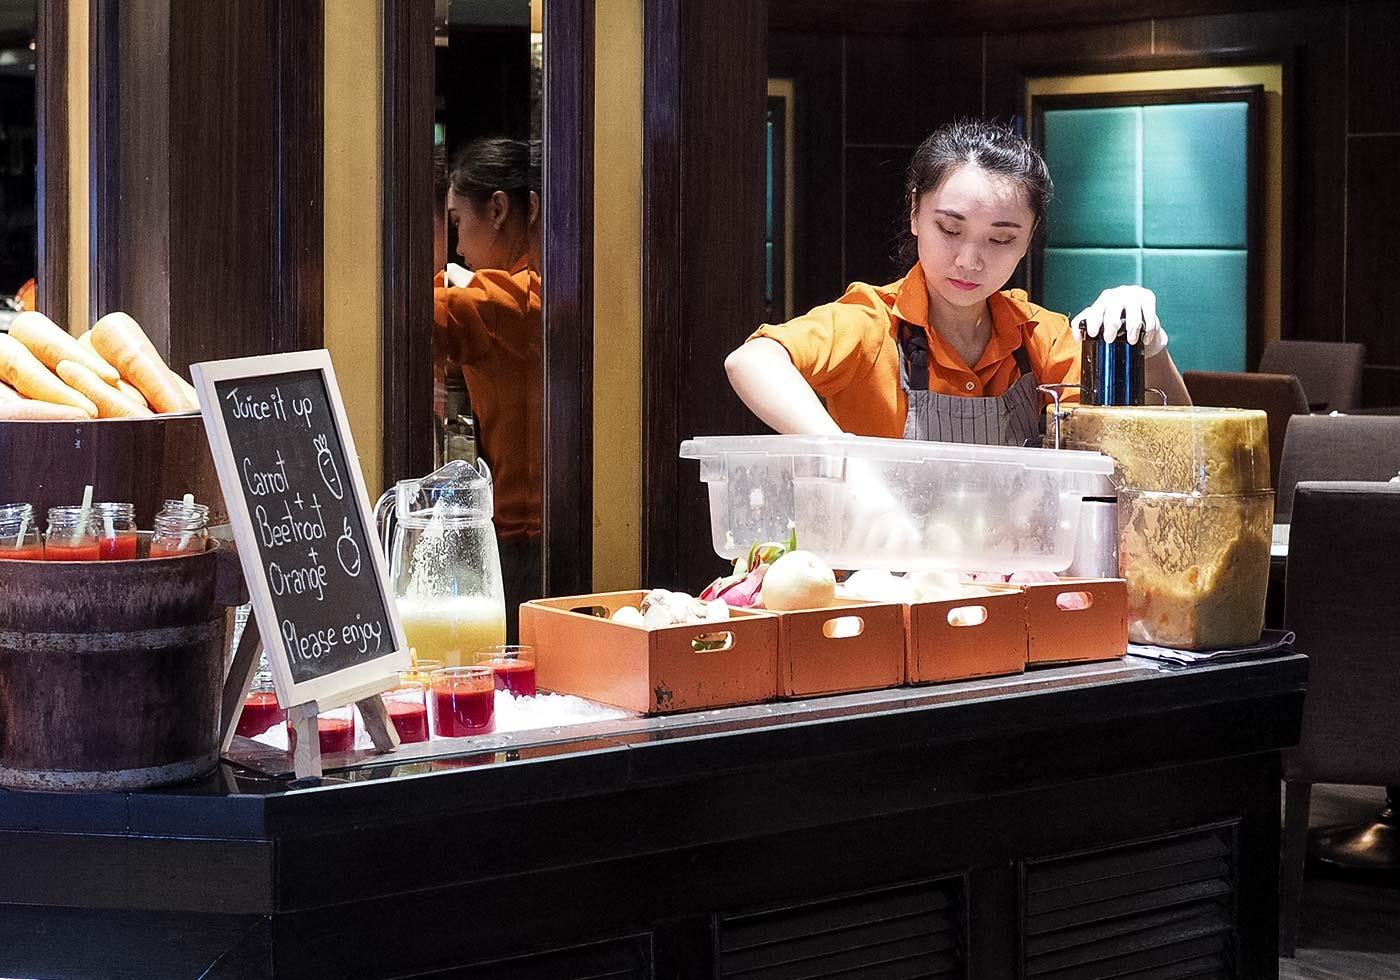 jw_marriott-bangkok-breakfast-fresh-juice